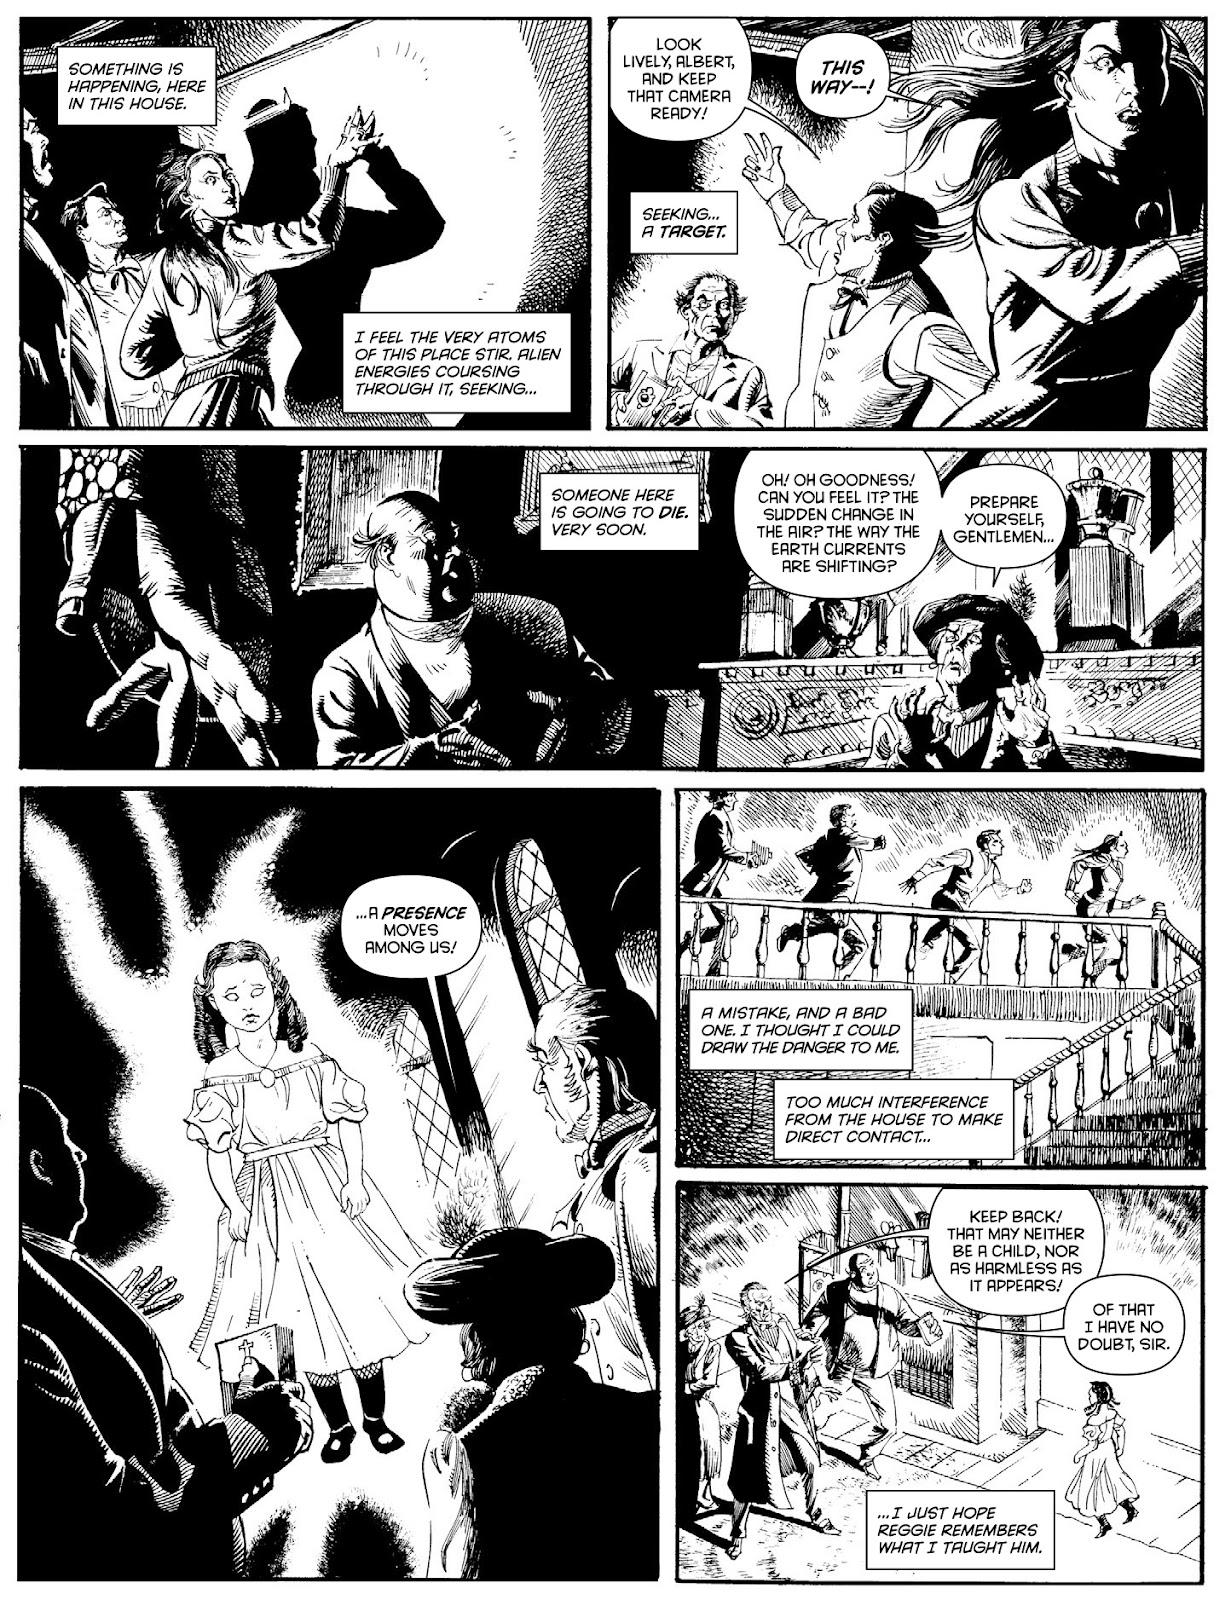 Judge Dredd Megazine (Vol. 5) issue 427 - Page 91